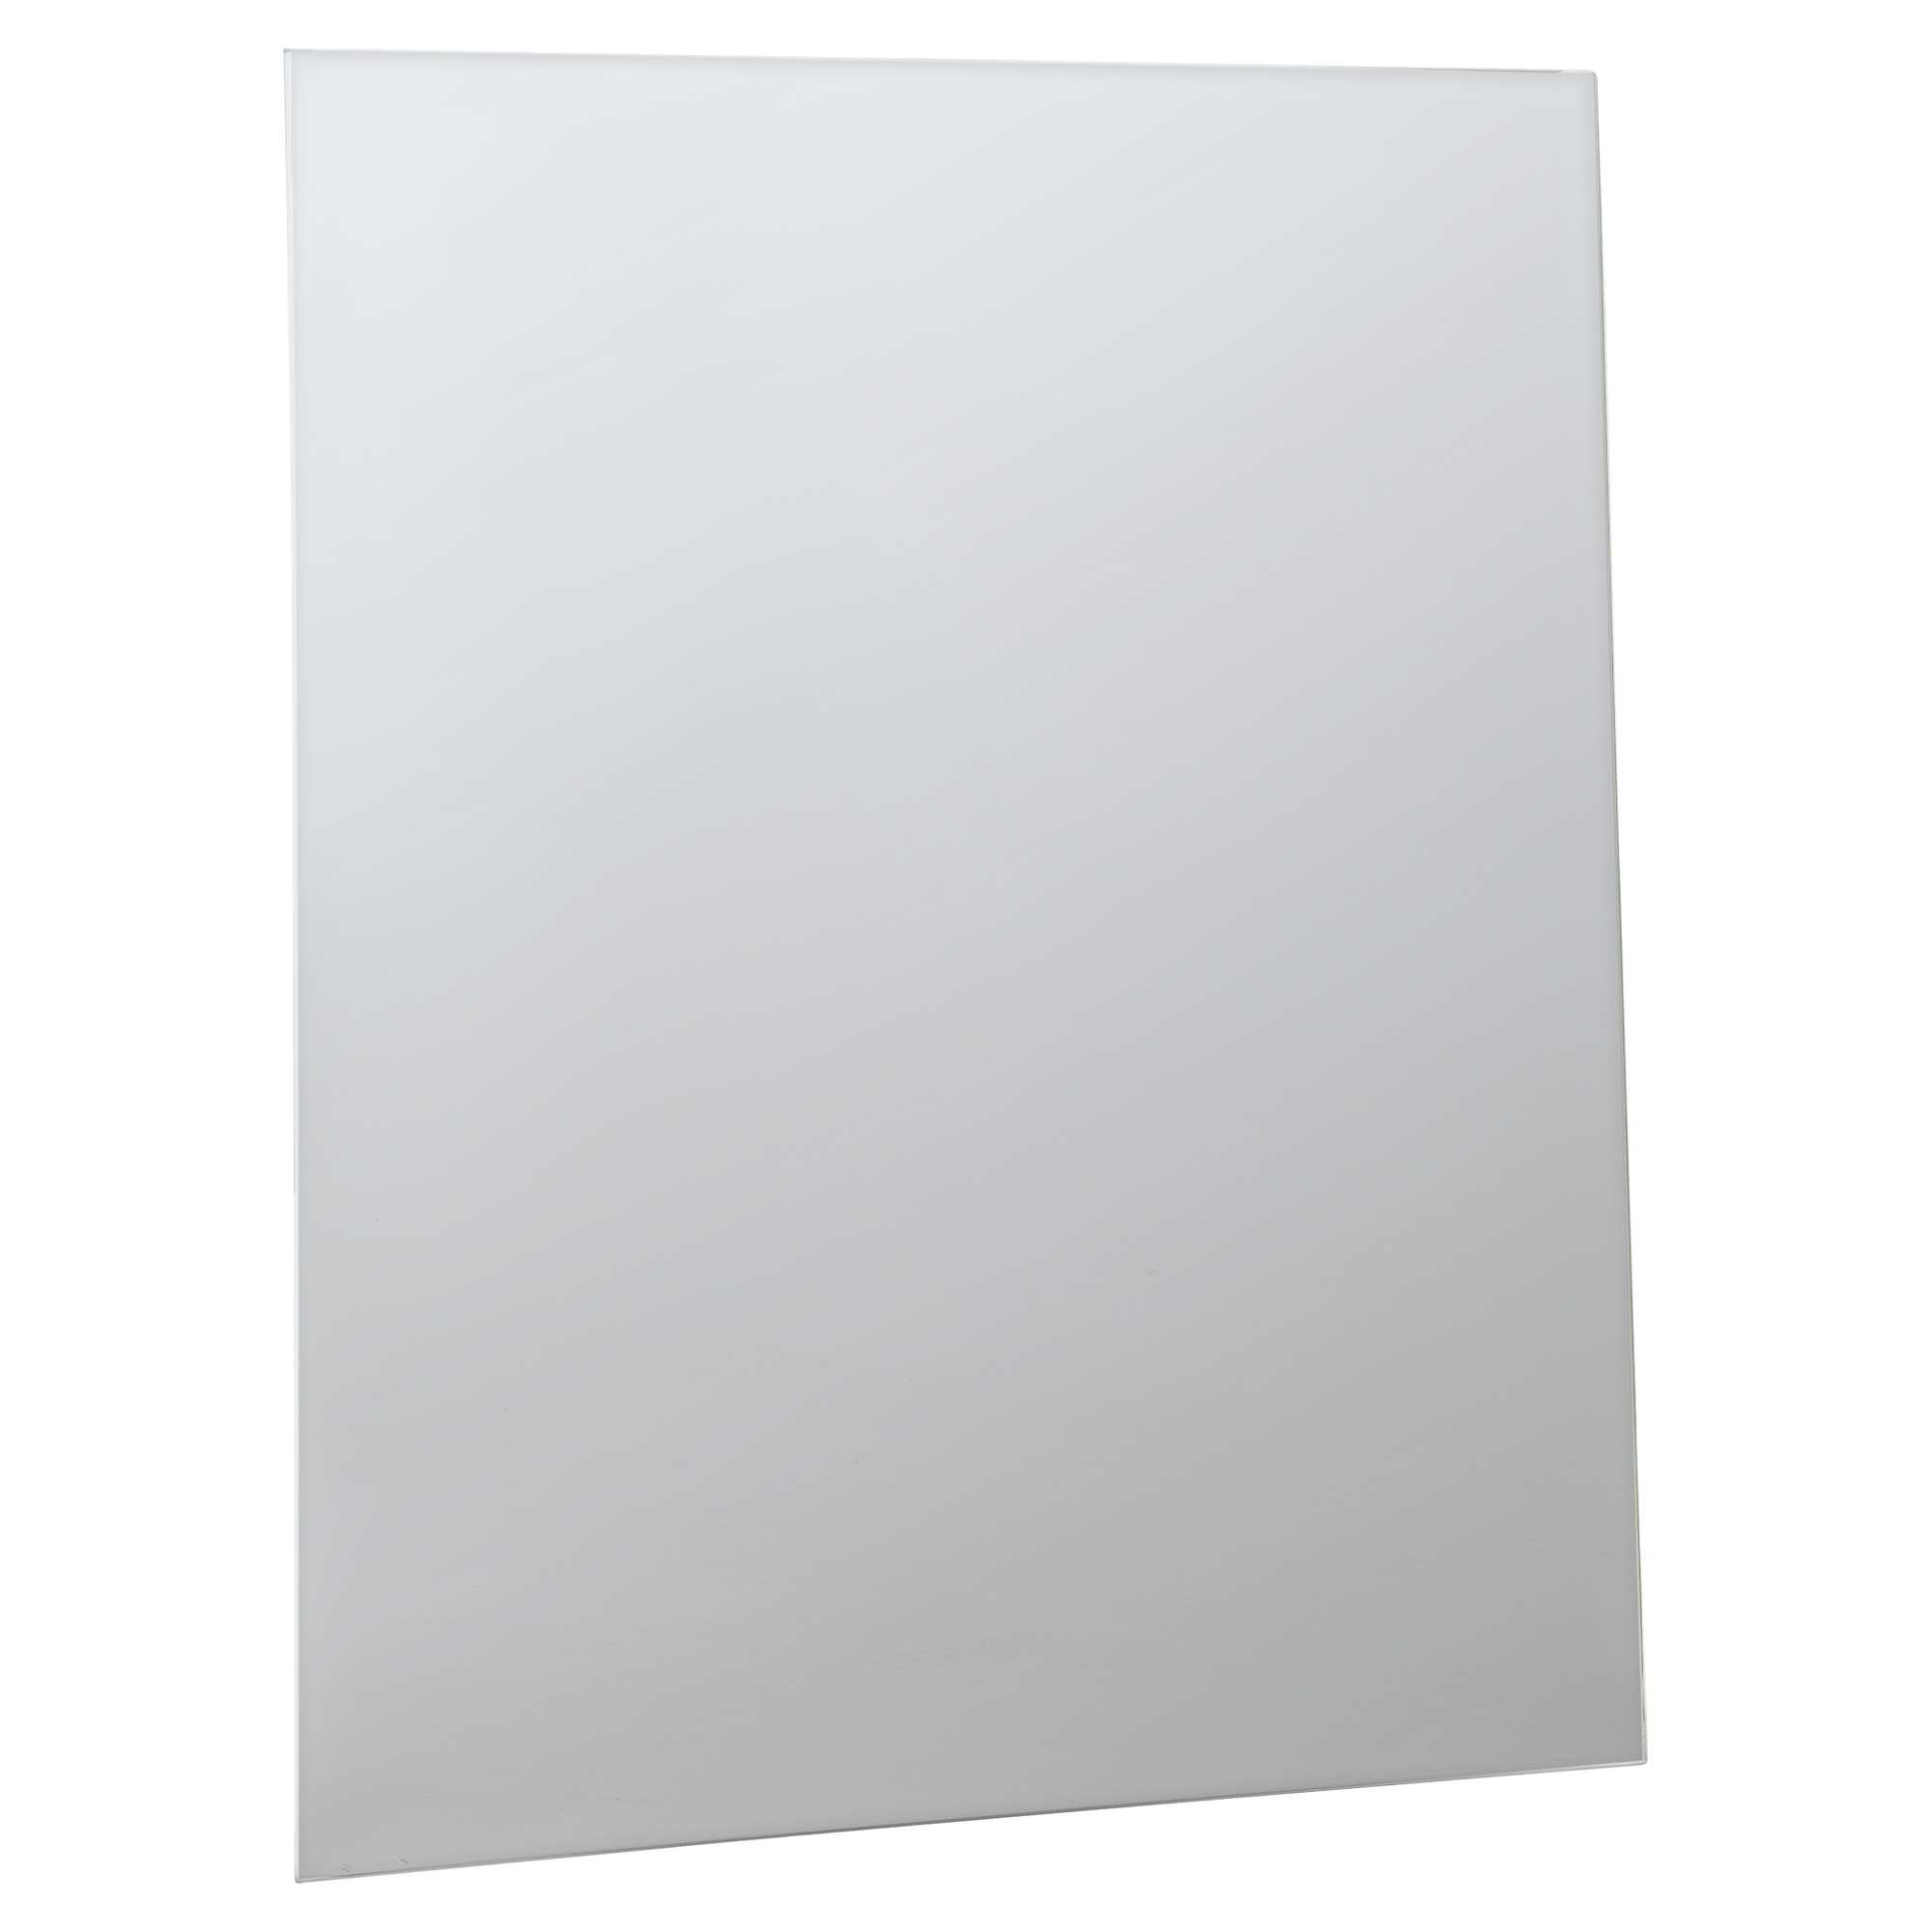 Kristall Form Spiegel Jump 50 X 60 ǀ Toom Baumarkt